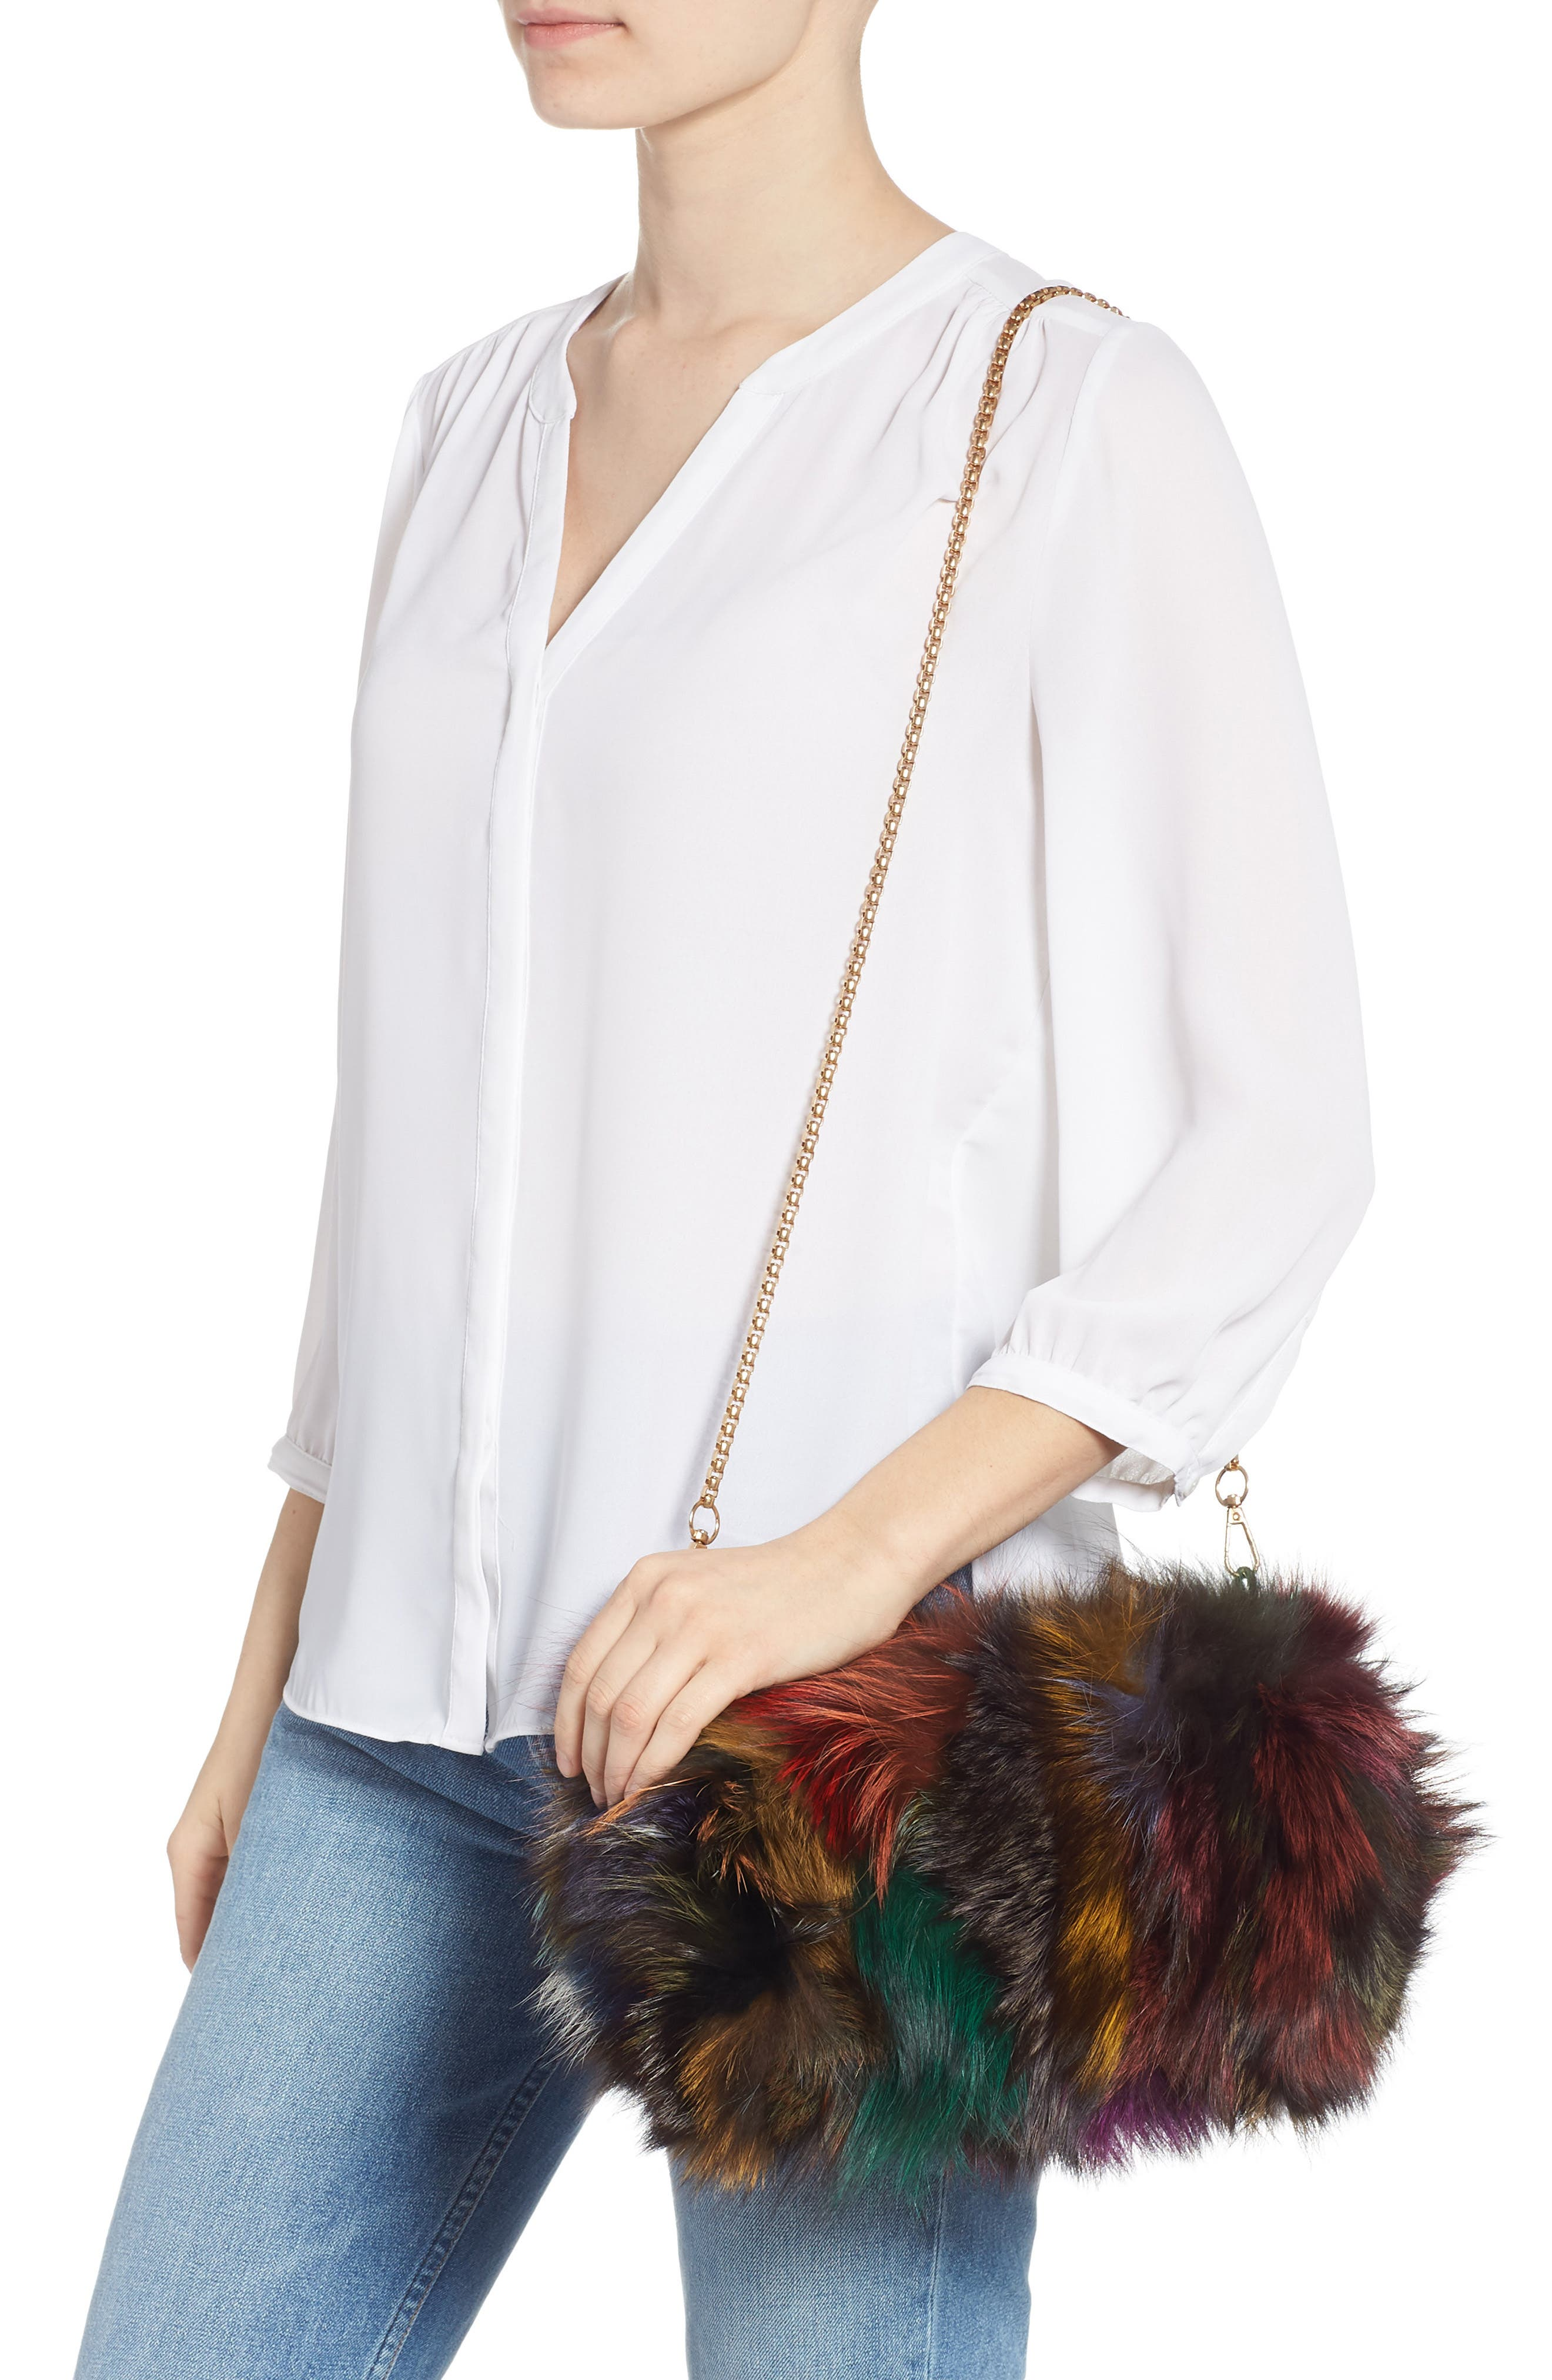 Elmo Genuine Silver Fox Fur Shoulder Bag,                             Alternate thumbnail 2, color,                             BLUE MULTI